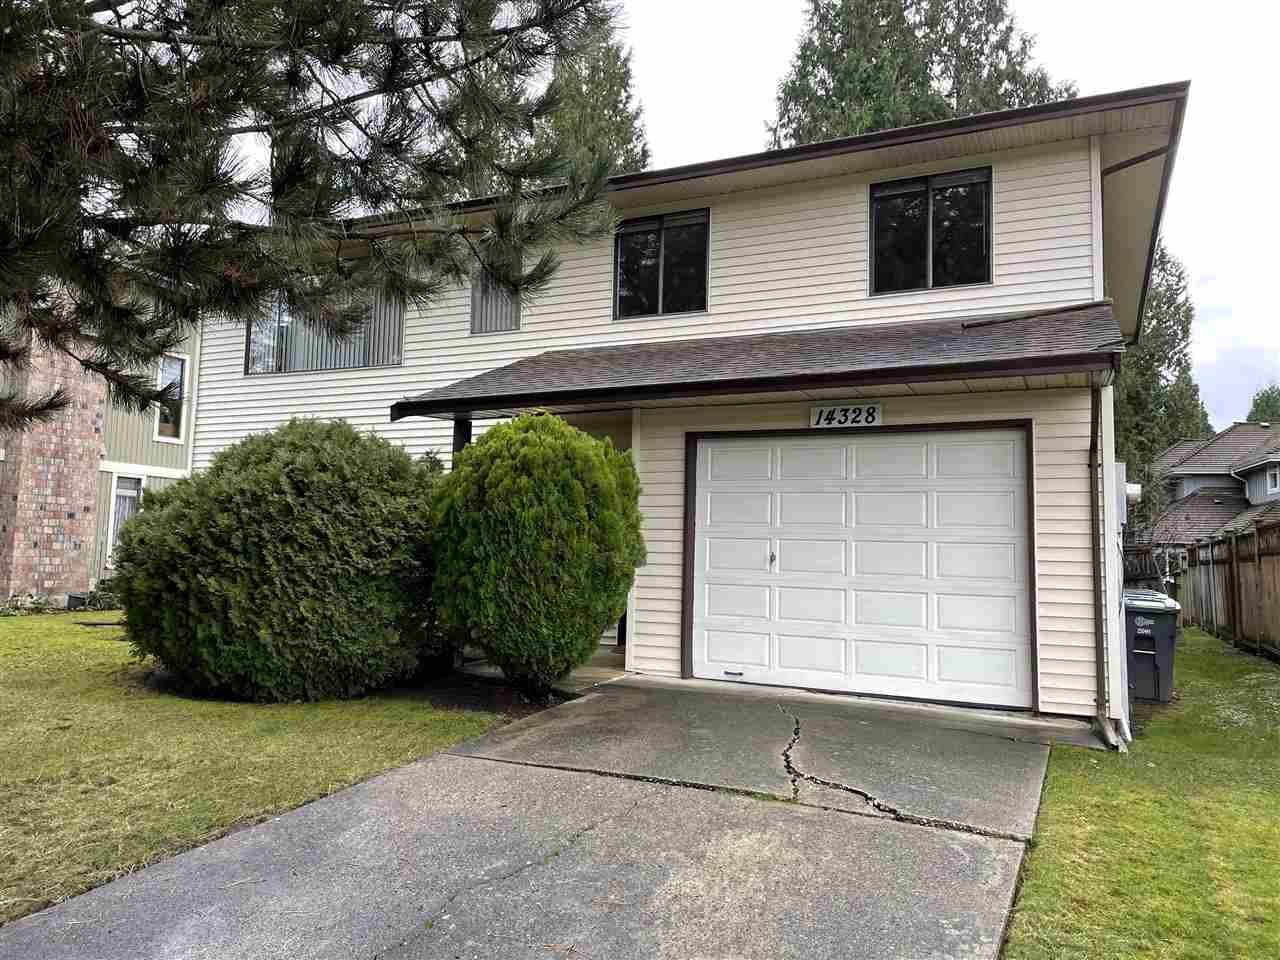 Main Photo: 14328 18 AVENUE in : Sunnyside Park Surrey House for sale : MLS®# R2523934